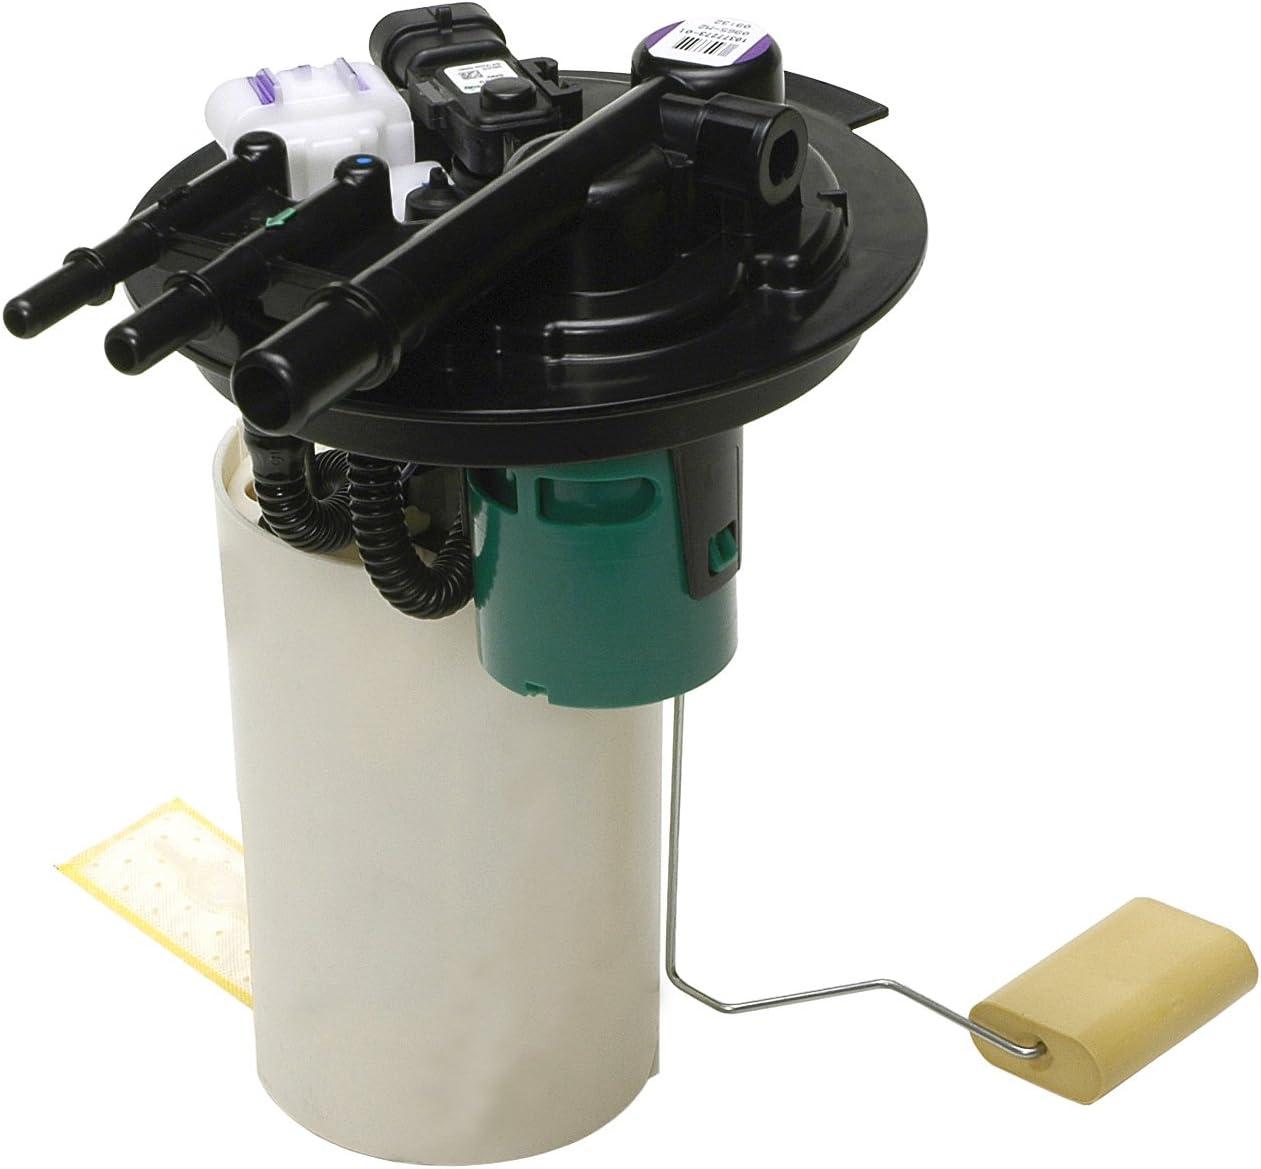 Delphi FG0385 Limited price sale Fuel Sale Special Price Pump Module